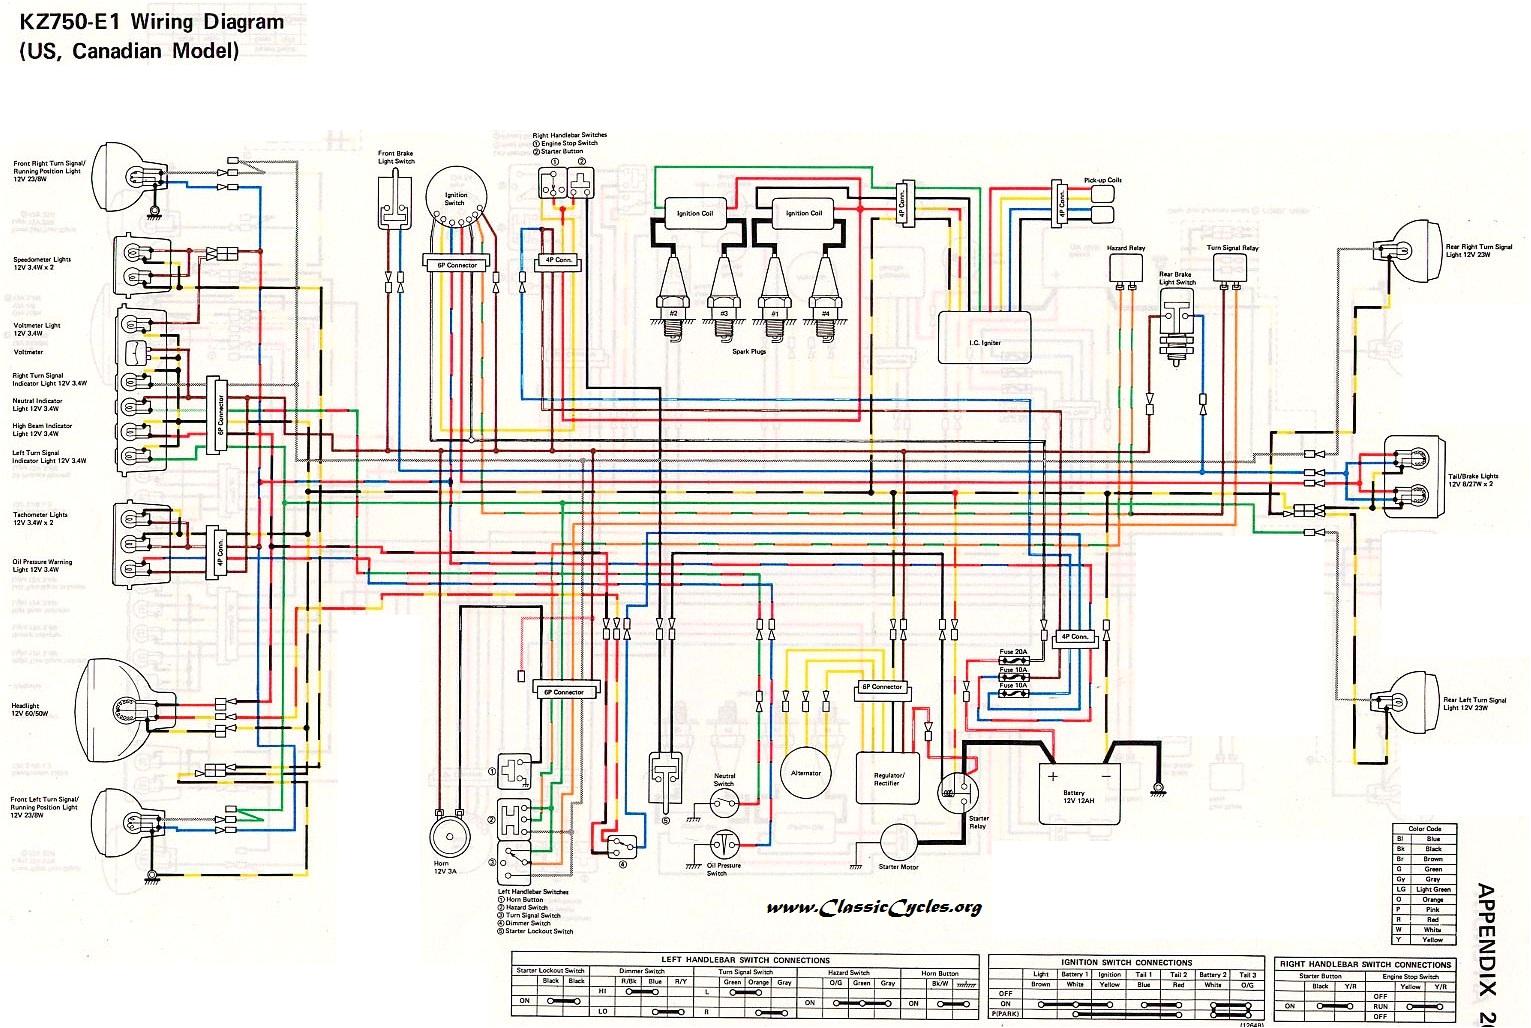 vn 750 wiring diagram wiring diagram schemakawasaki vulcan 750 wiring harness wiring diagram schema 2006 vulcan